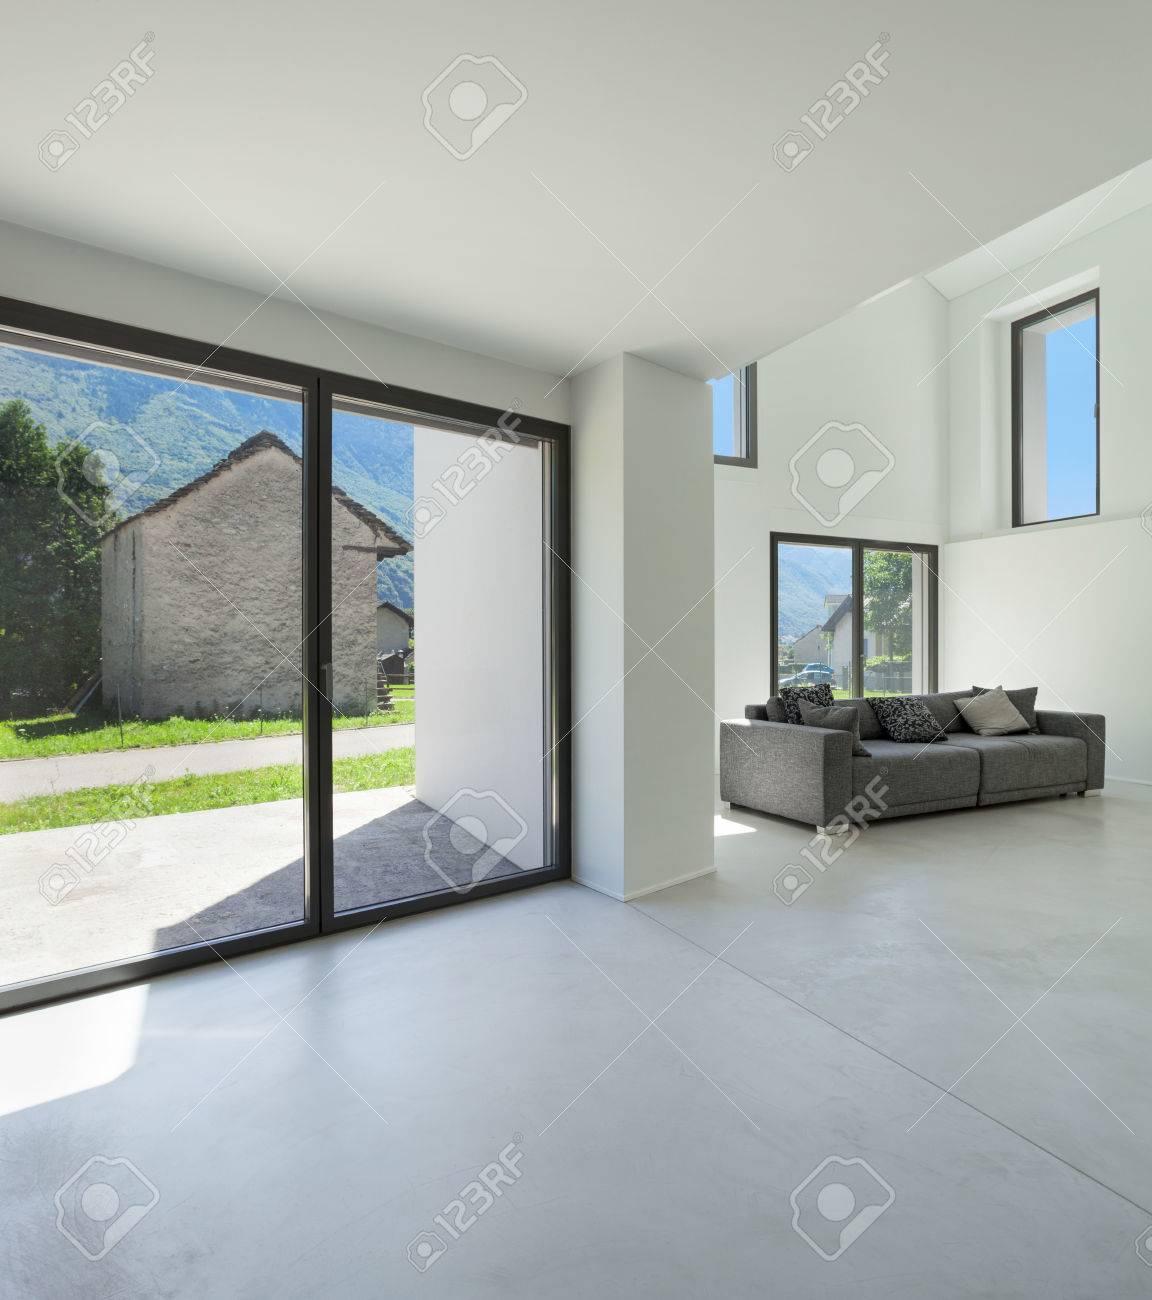 Style De Veranda Moderne architecture, interior modern house, living room with sofa